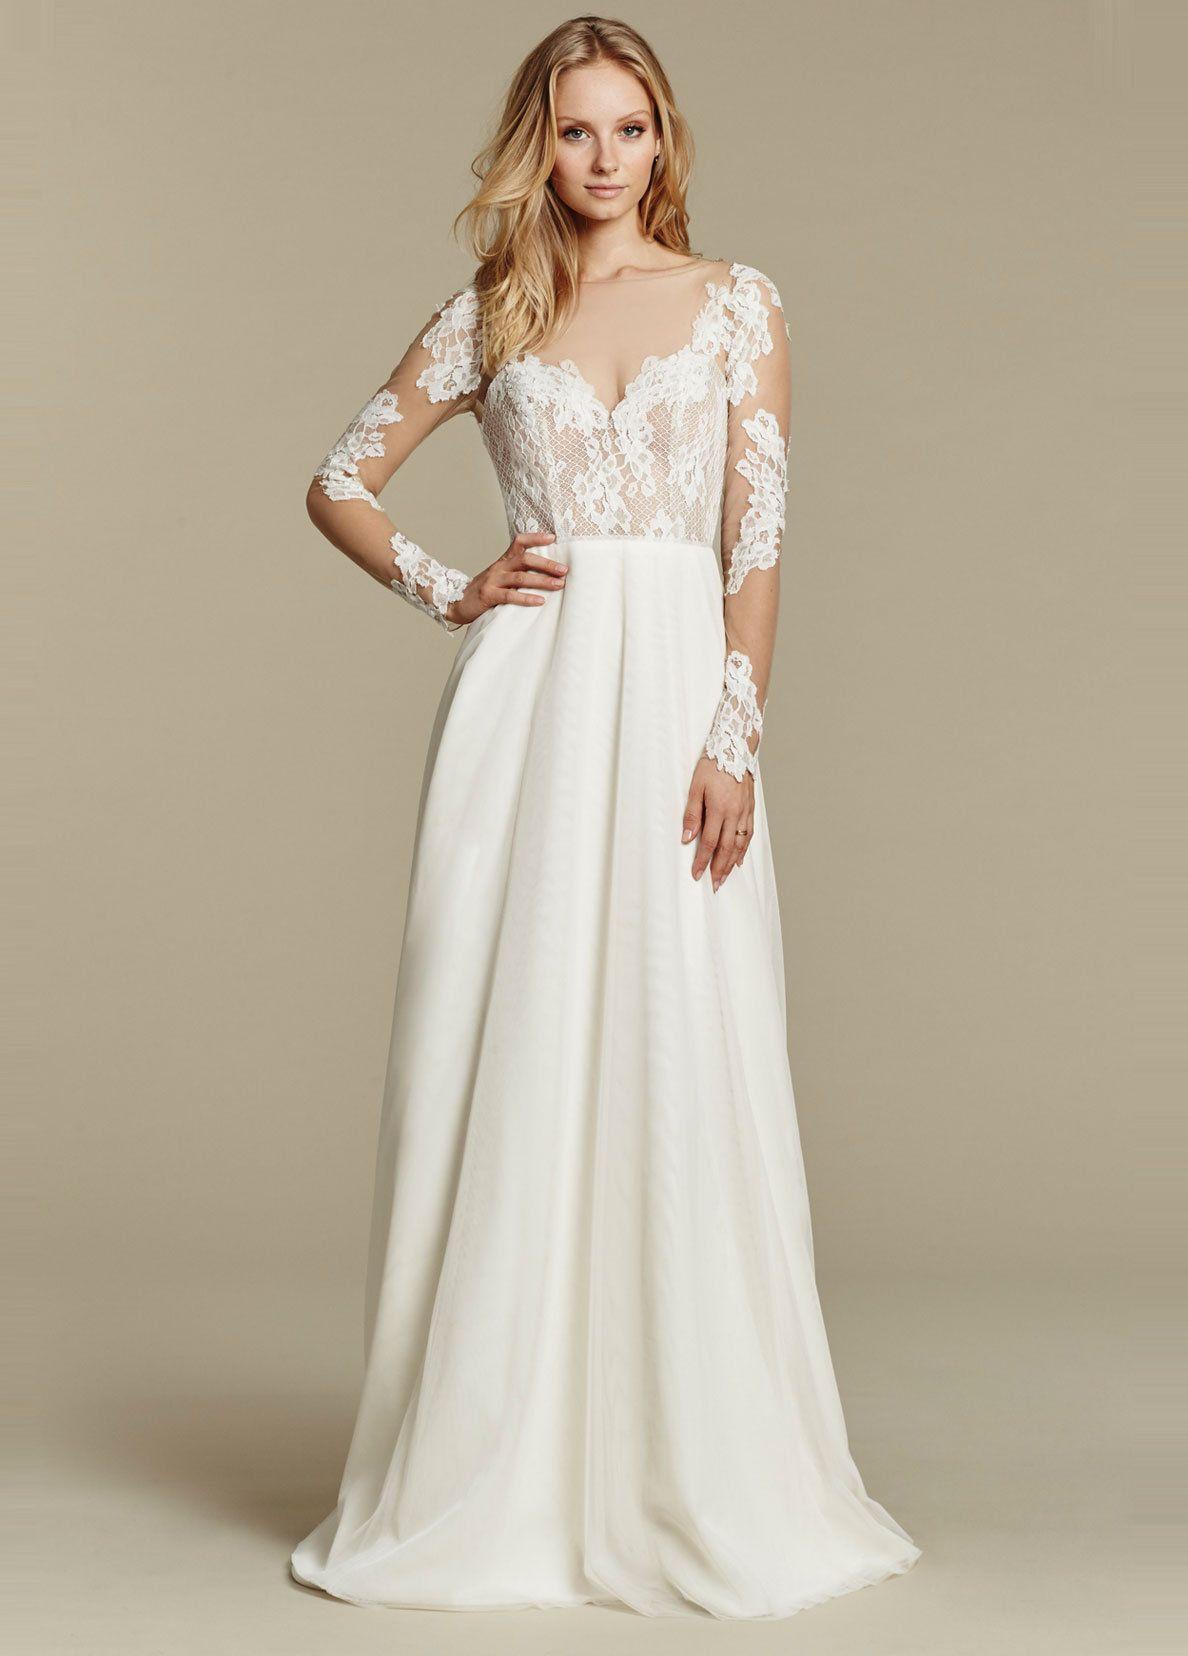 Simple lace long sleeve illusion sheath wedding dress blush by